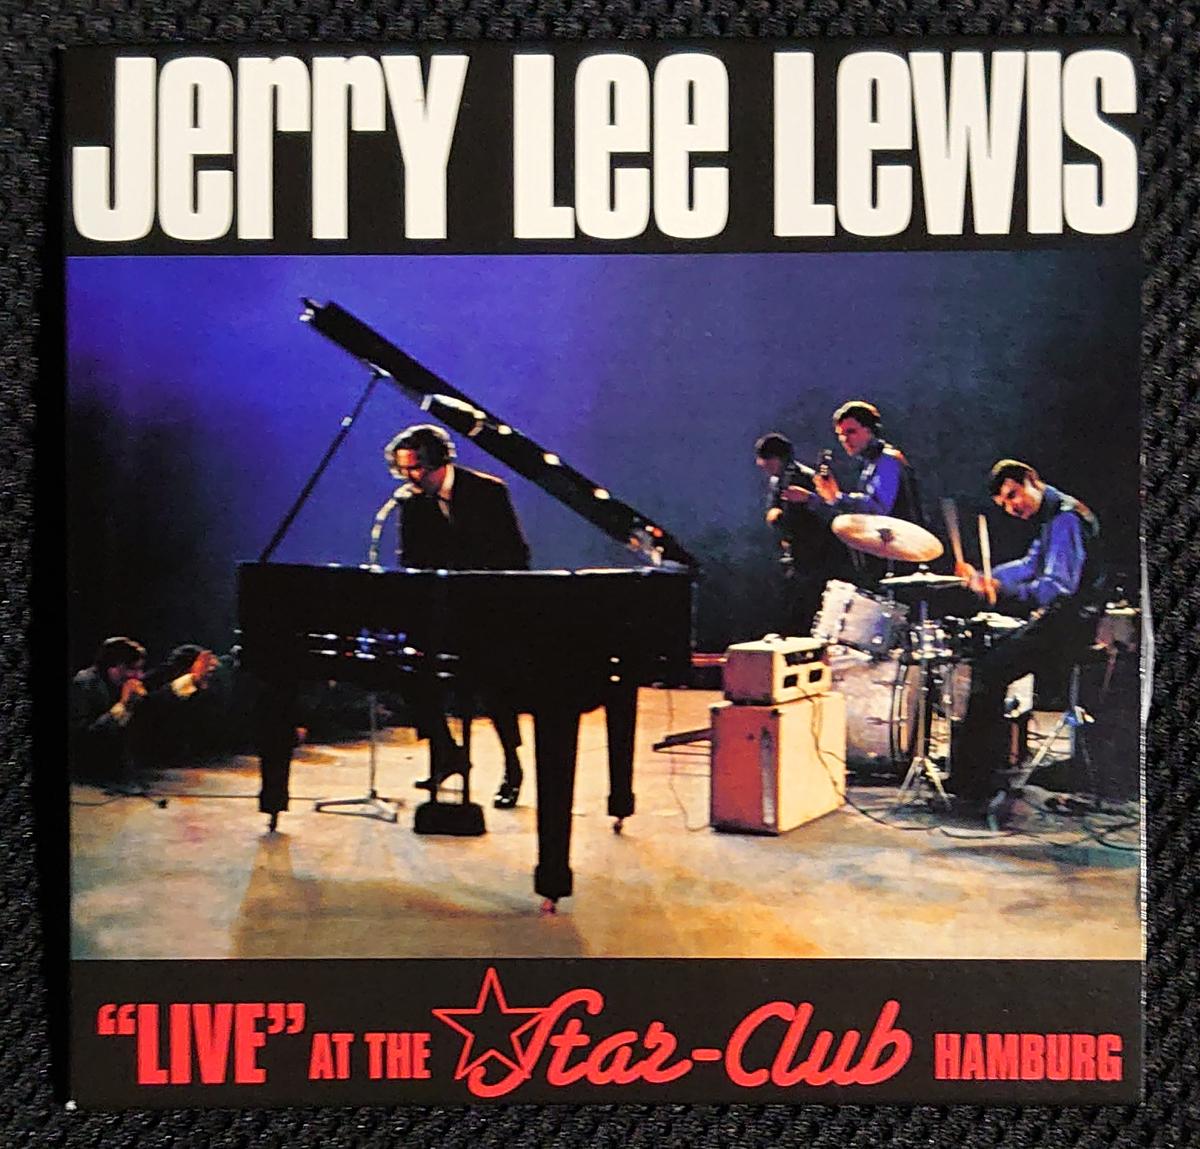 Jerry Lee Lewis_Live at the Star-Club,Hamburg